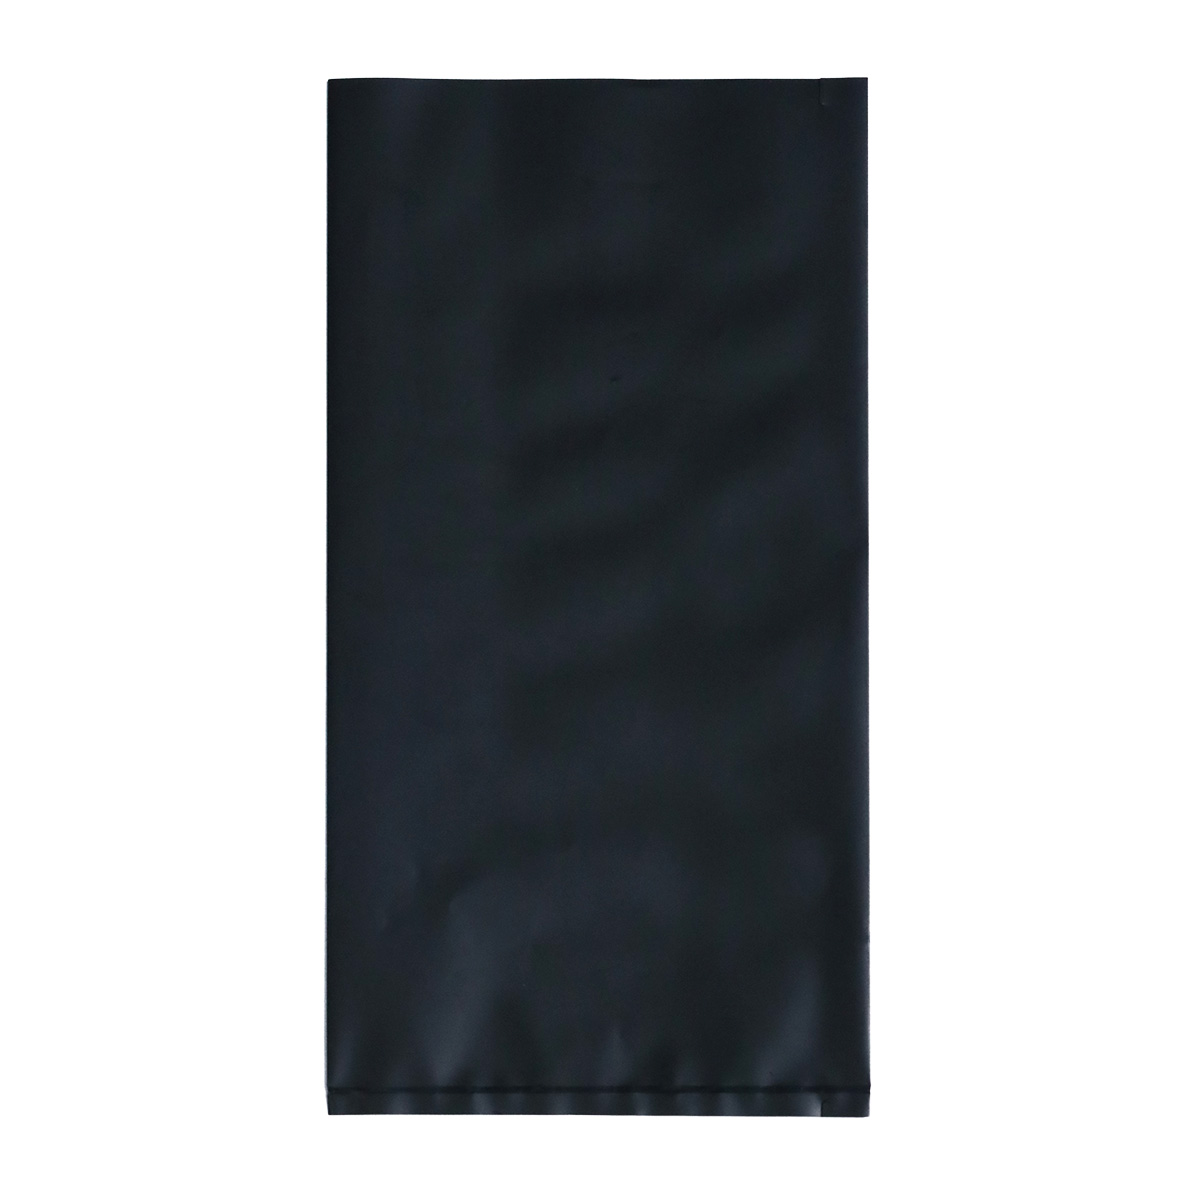 PE导电袋,导电防静电袋,黑色导电袋,志辉盛包装